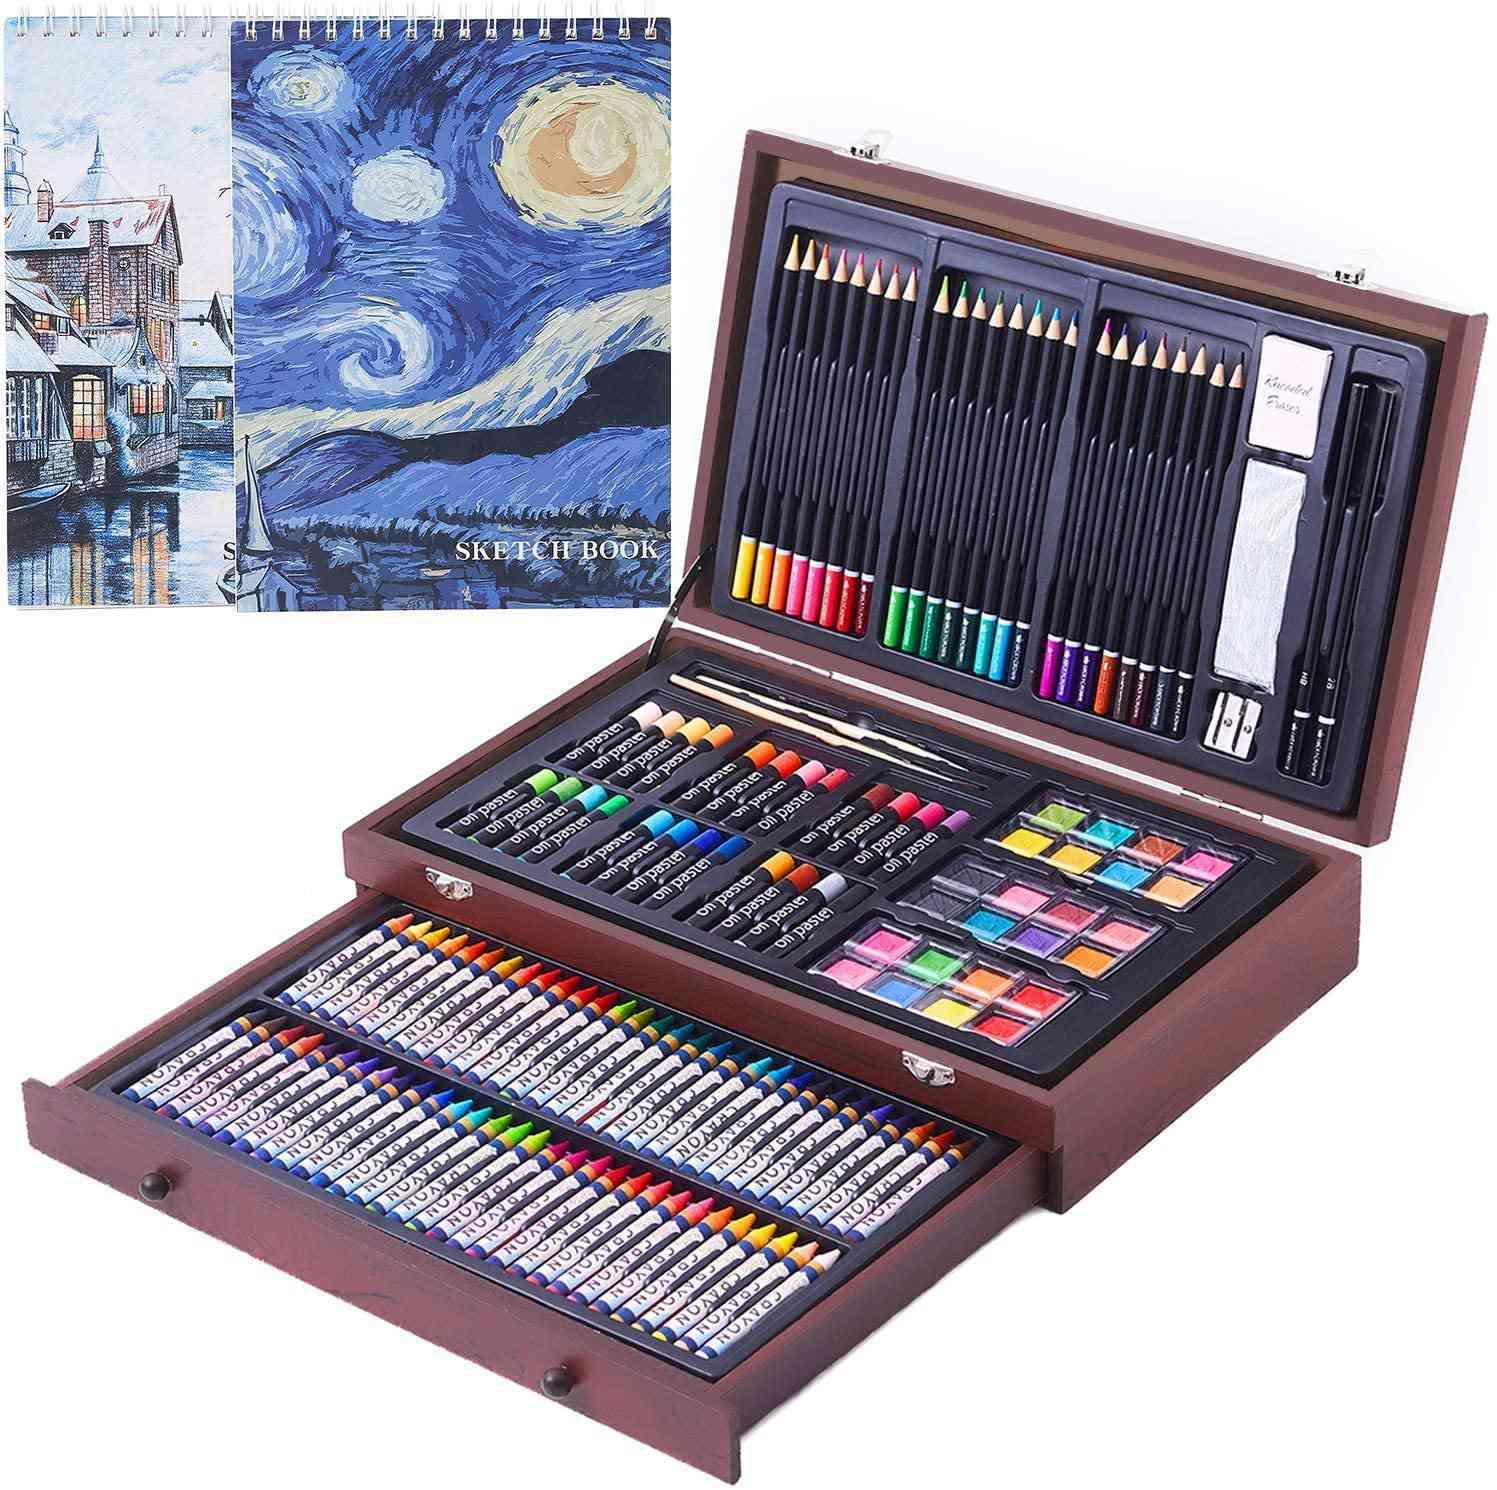 COOL BANK 145-Piece Deluxe Wood Art Creativity Set